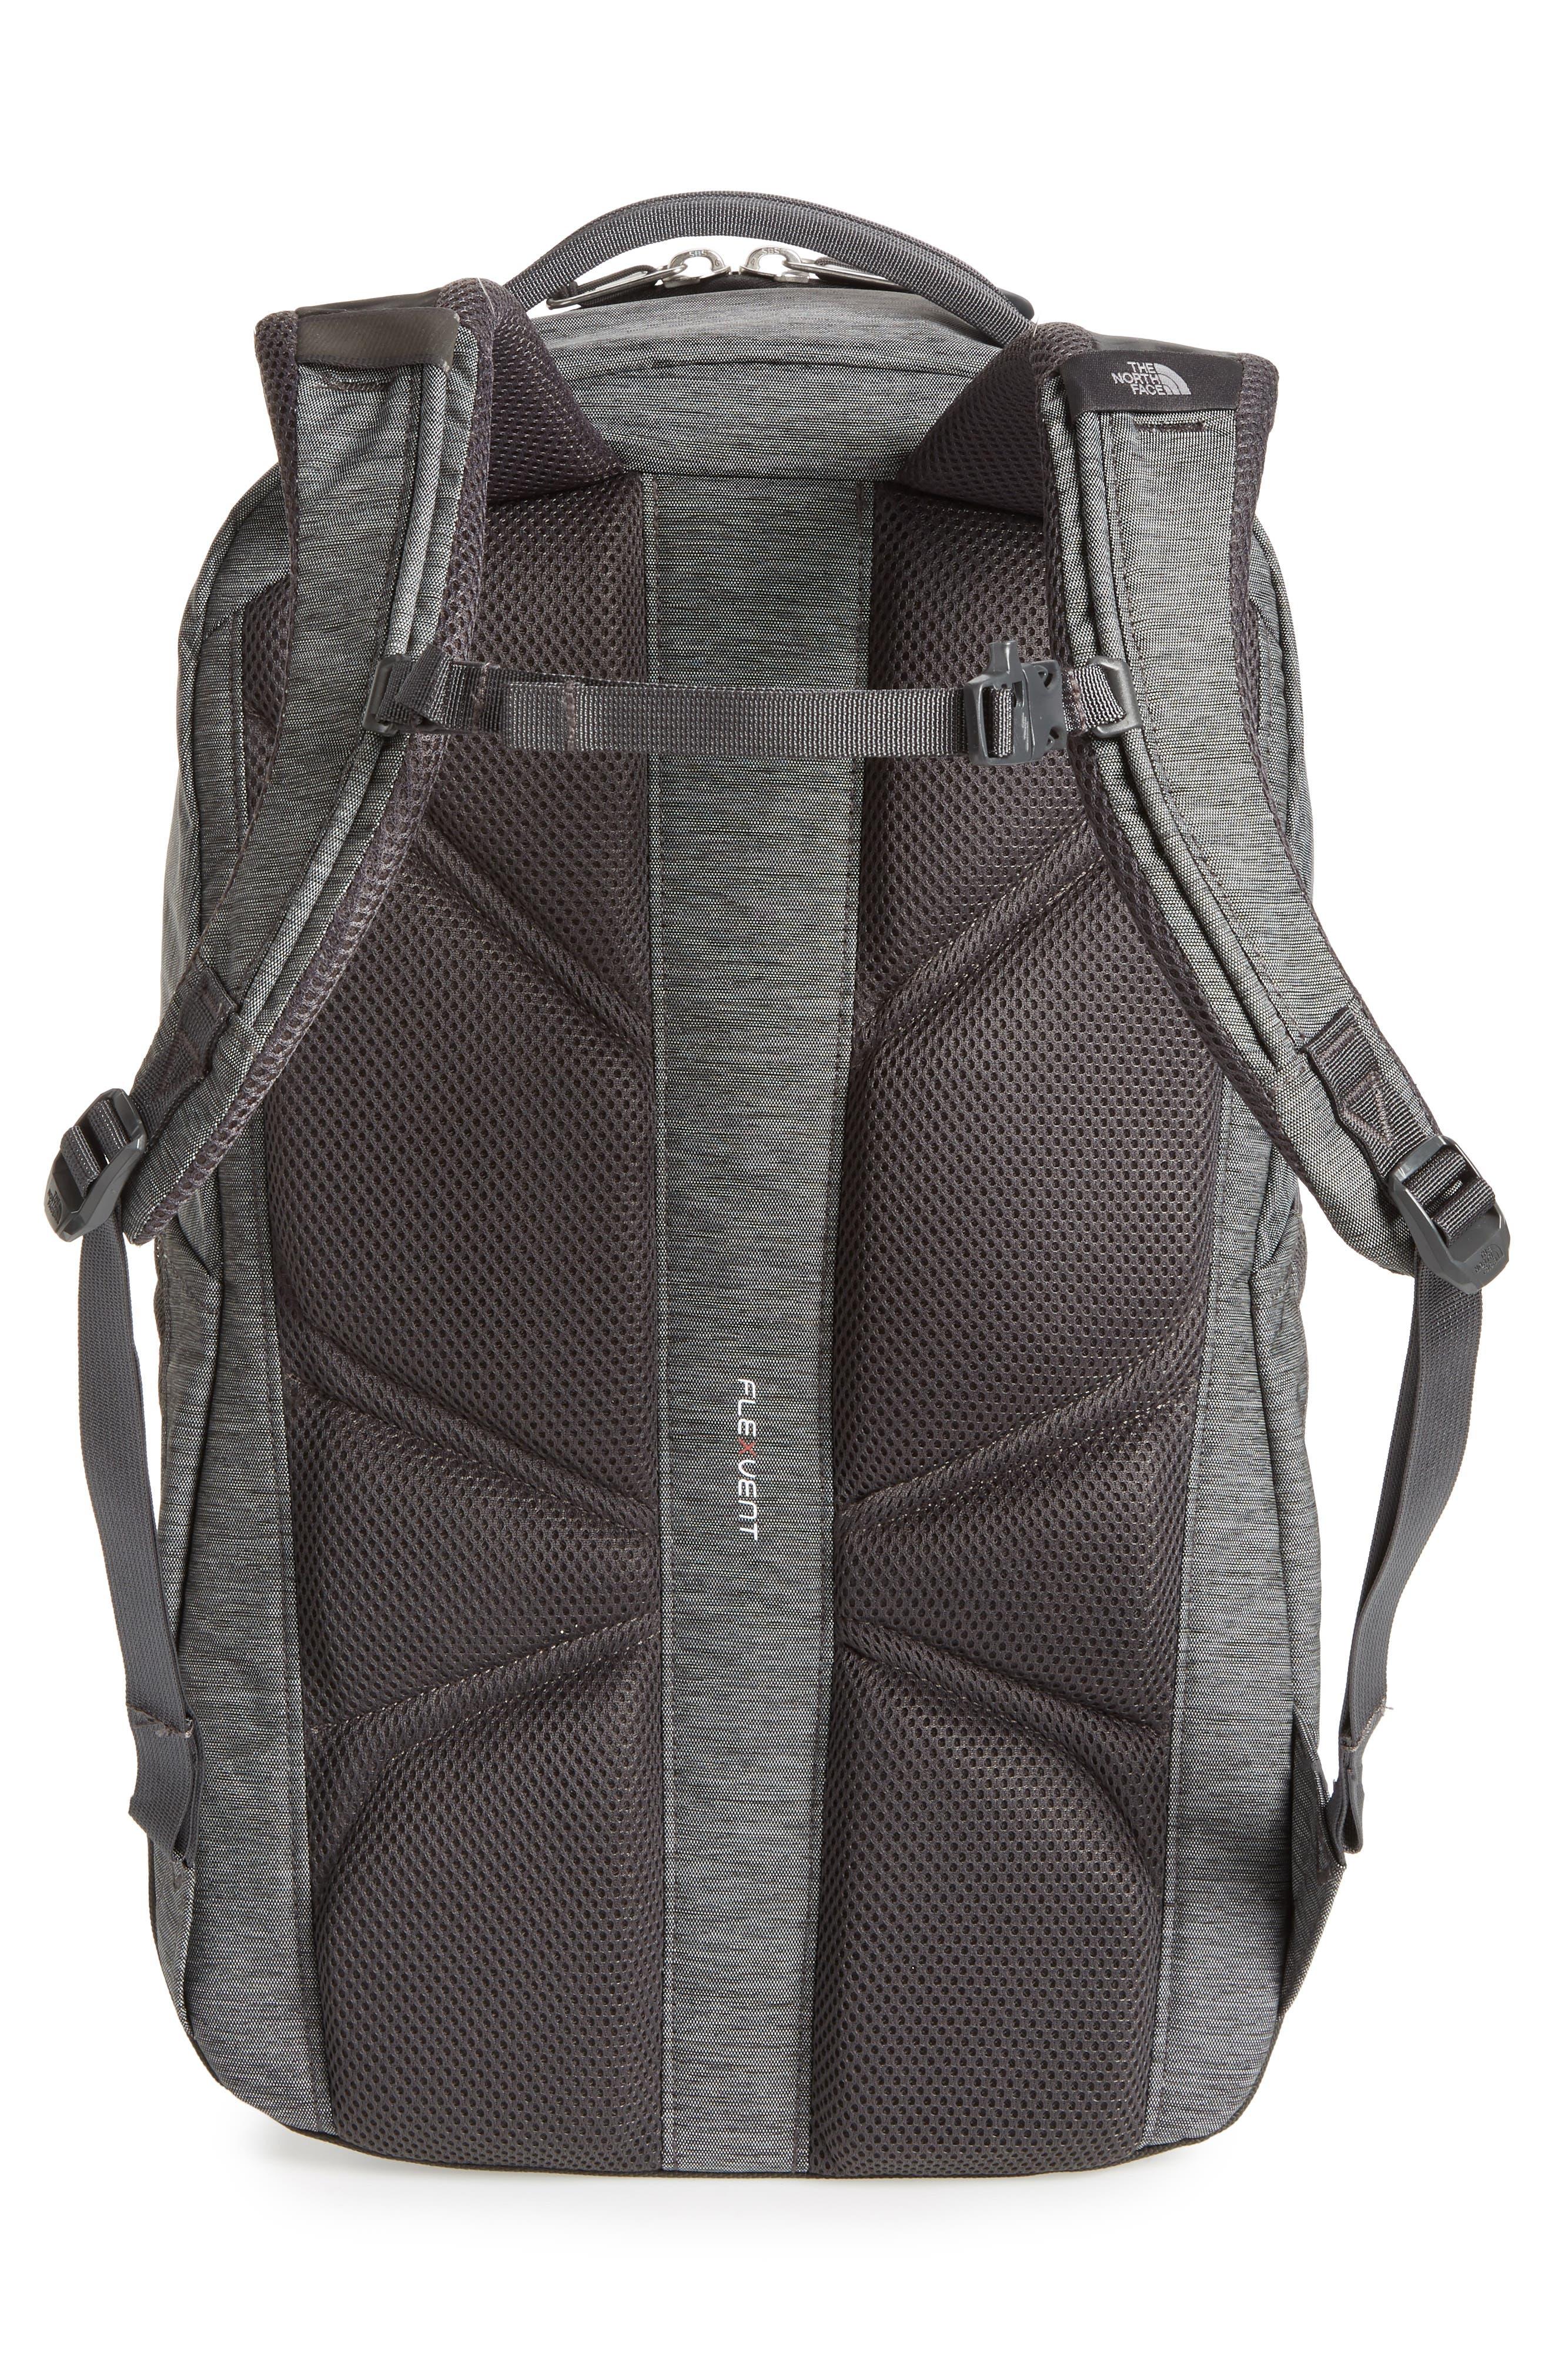 Vault Backpack,                             Alternate thumbnail 2, color,                             ASPHALT GREY/ DRAMATIC PLUM